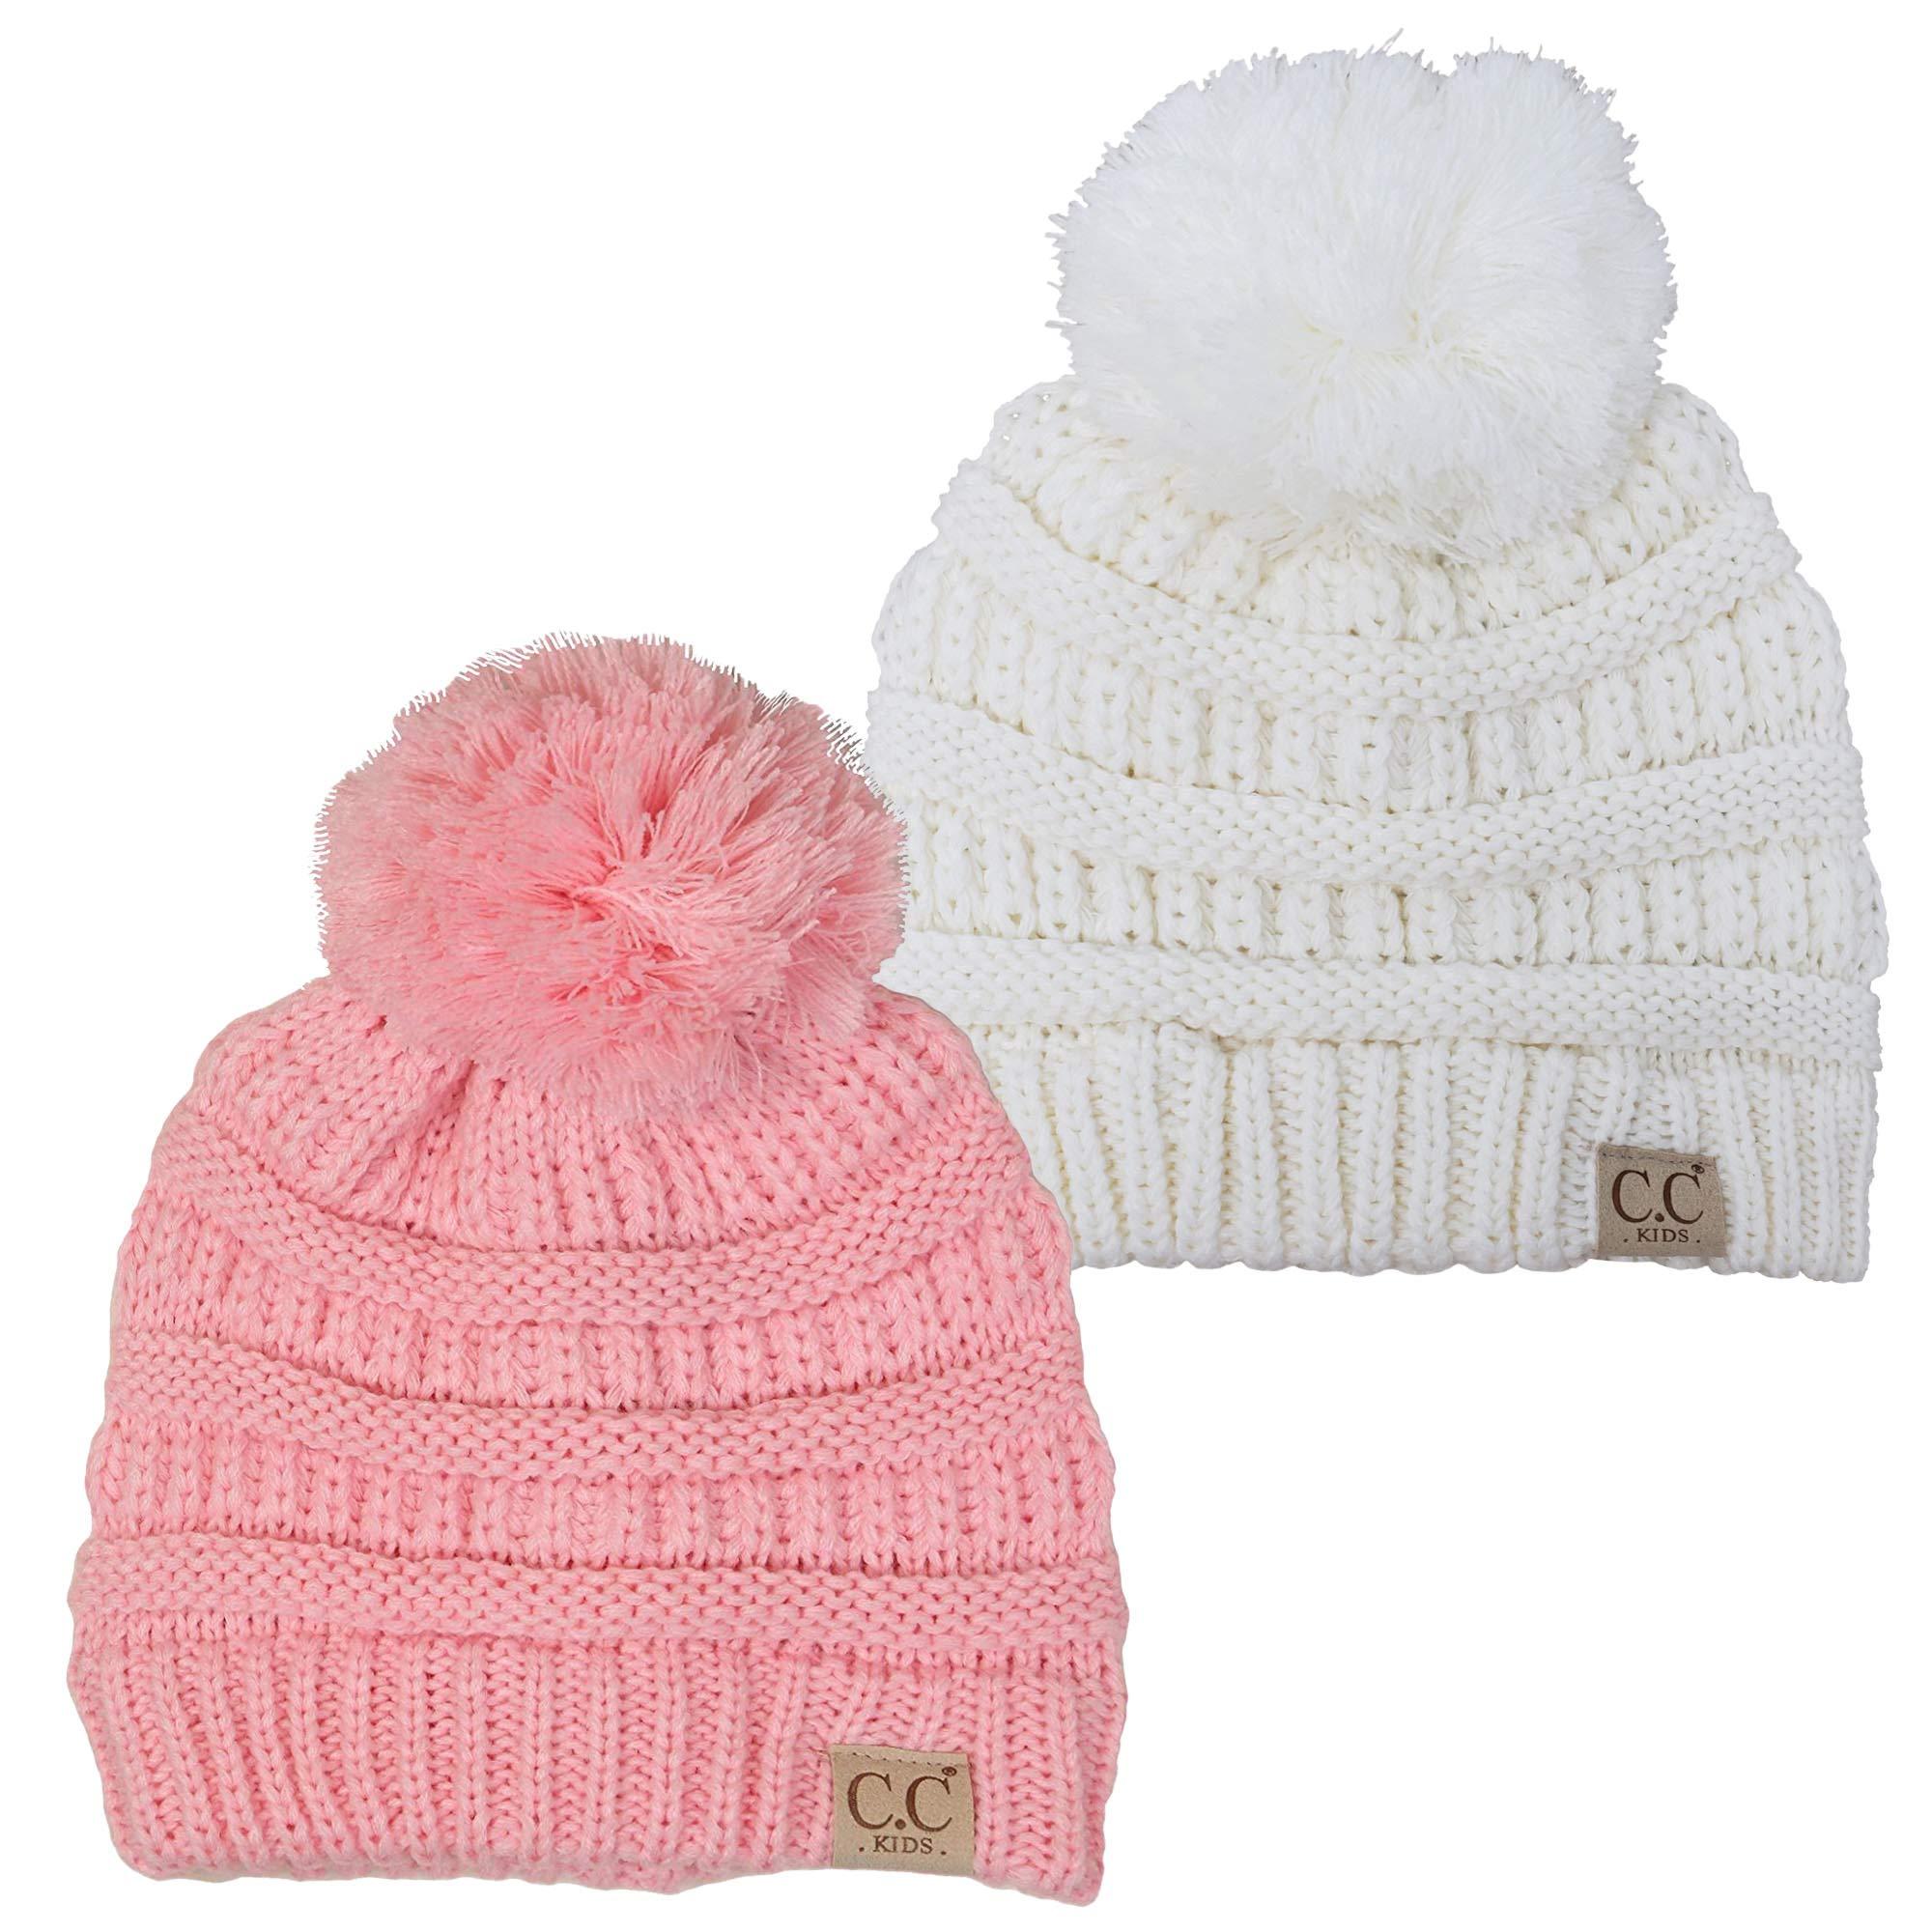 H-6847-2-2529 Kids Pom Beanie Bundle - 1 Ivory, 1 Pale Pink (2 Pack)